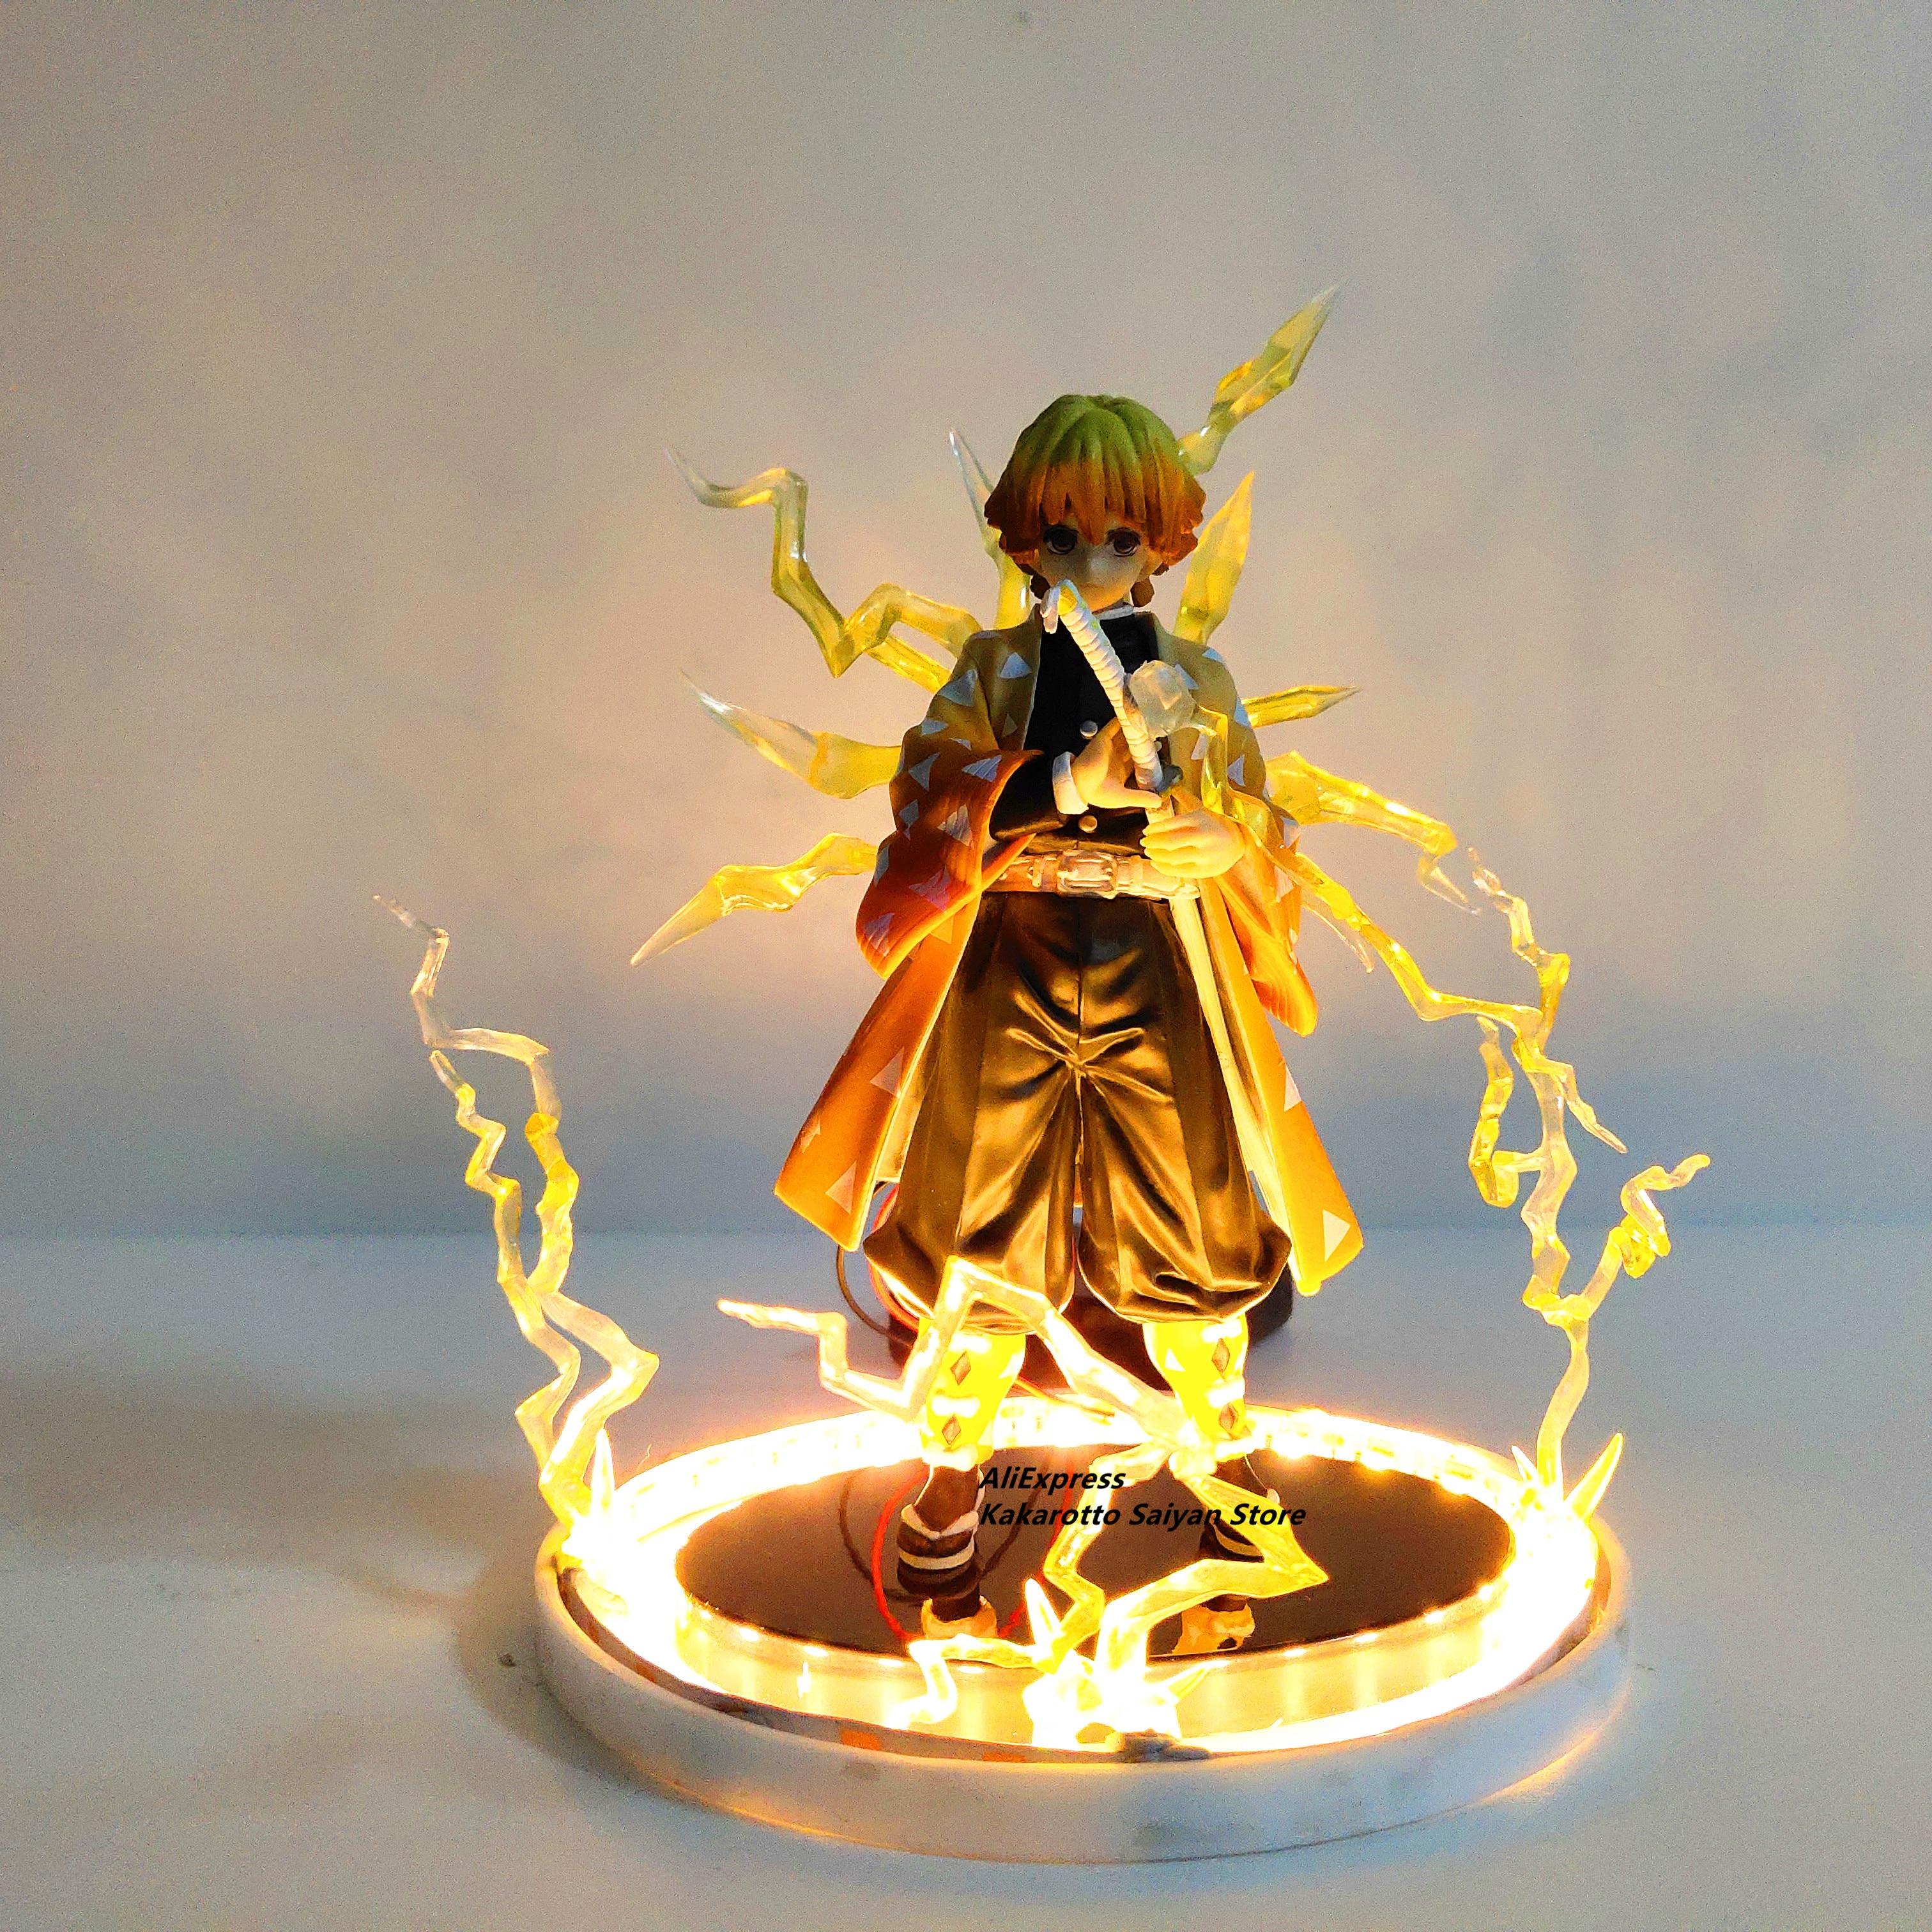 Demon Slayer Agatsuma Zenitsu PVC Action Figures Thunderclap And Flash Effect Anime Kimetsu No Yaiba Figurine Model Toys